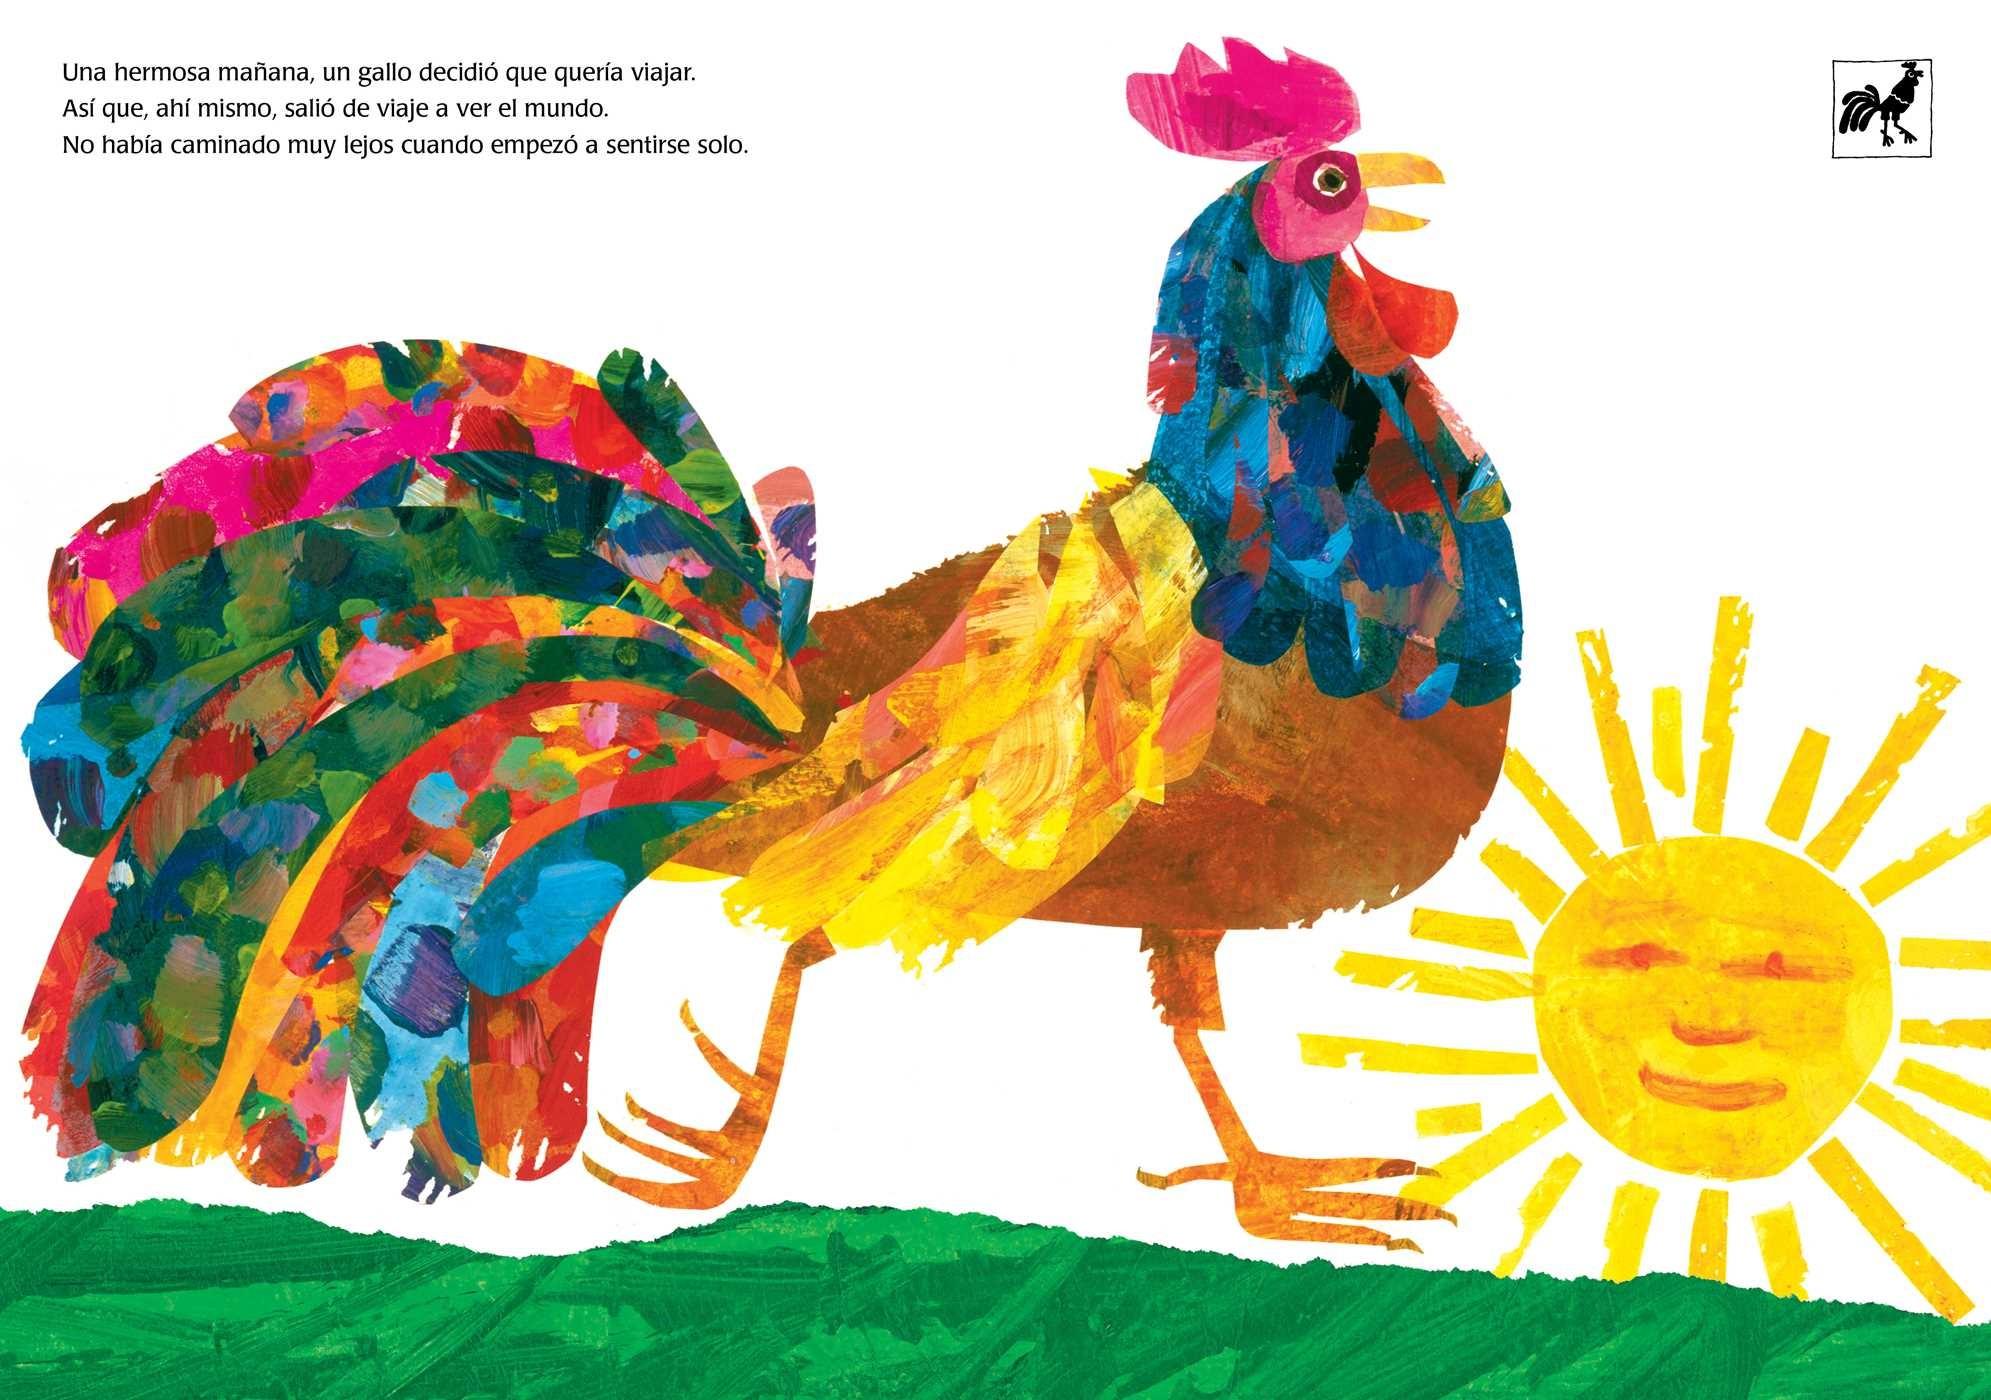 El gallo sale a ver el mundo (Rooster's Off to See the World